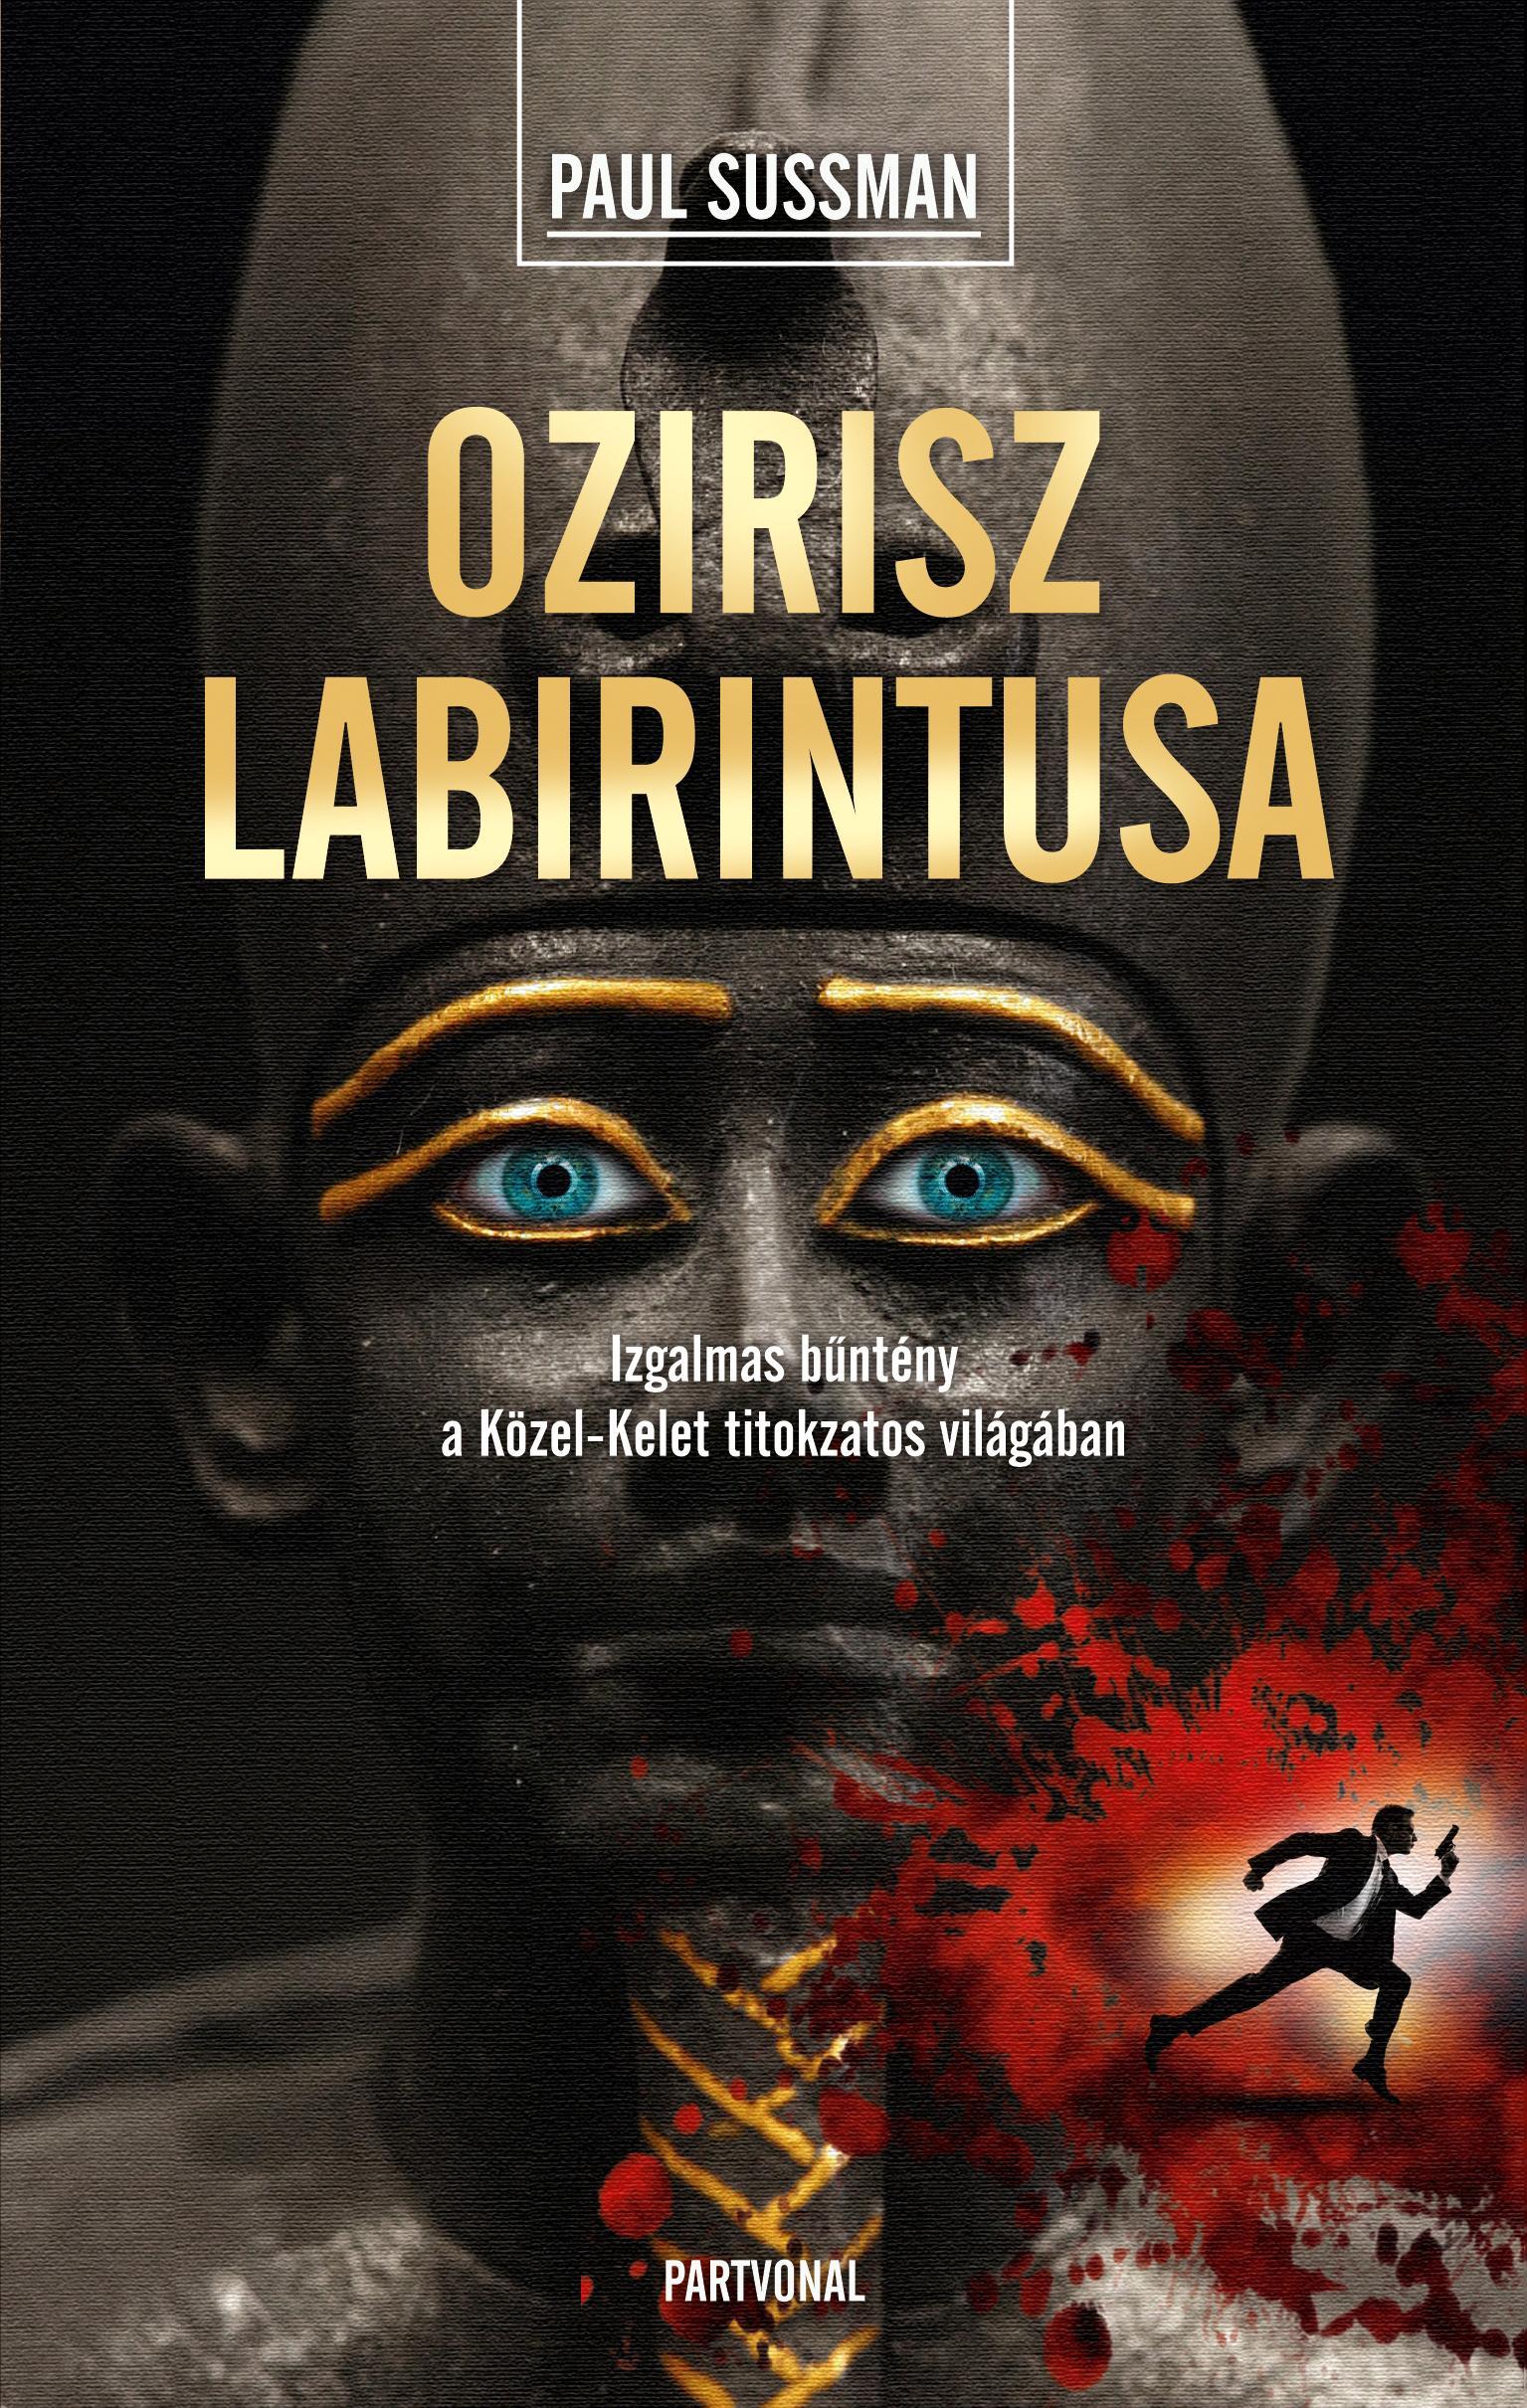 OZIRISZ LABIRINTUSA